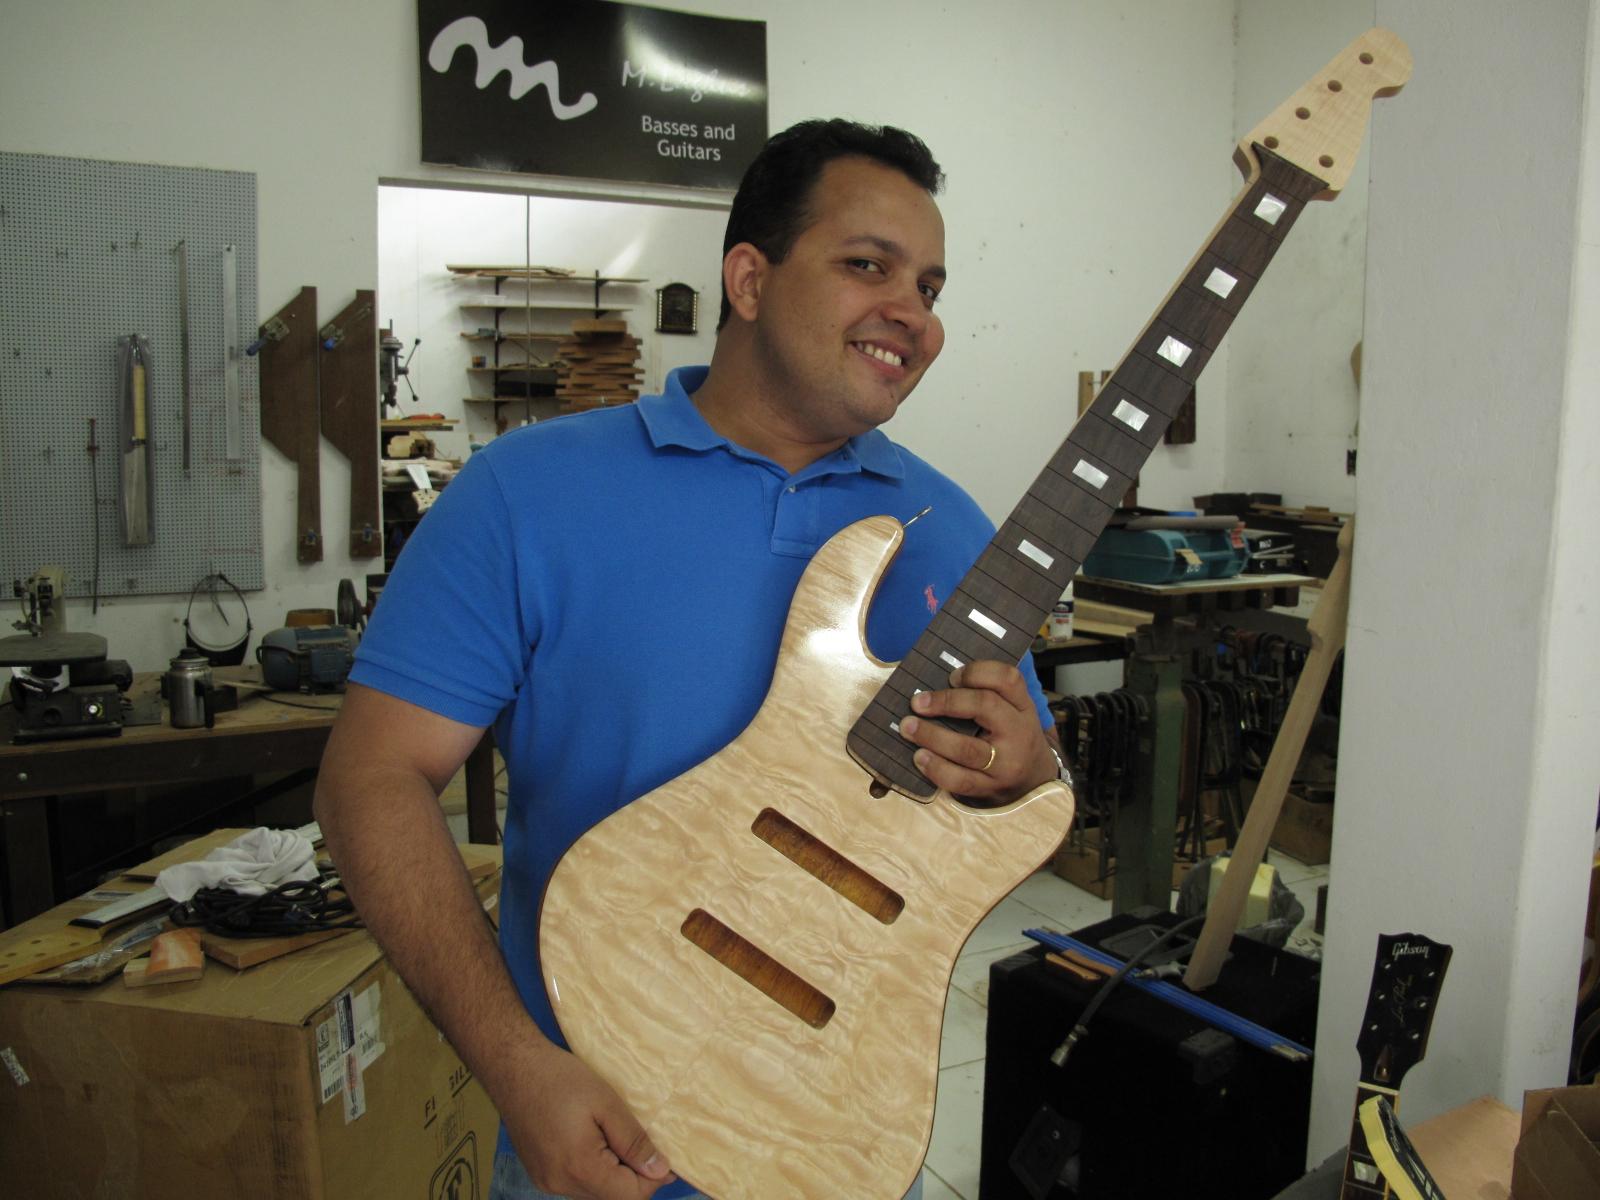 Jazz Bass Custom 5 - M Laghus - Página 2 5941692476_600c27451c_o